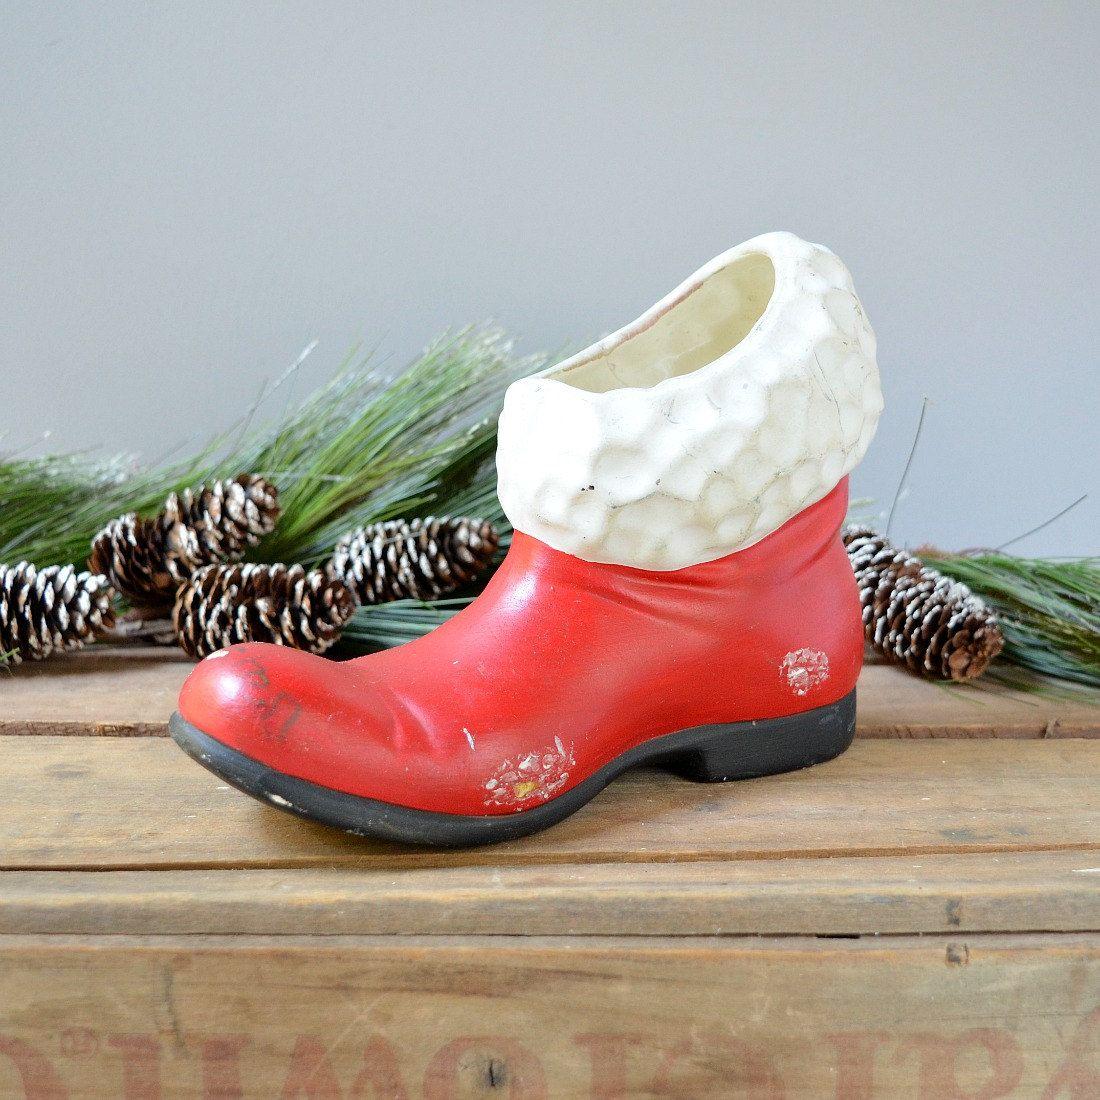 Vintage santa boot vintage ceramic santa boot santa boot vase vintage santa boot vintage ceramic santa boot santa boot vase santa boot planter reviewsmspy